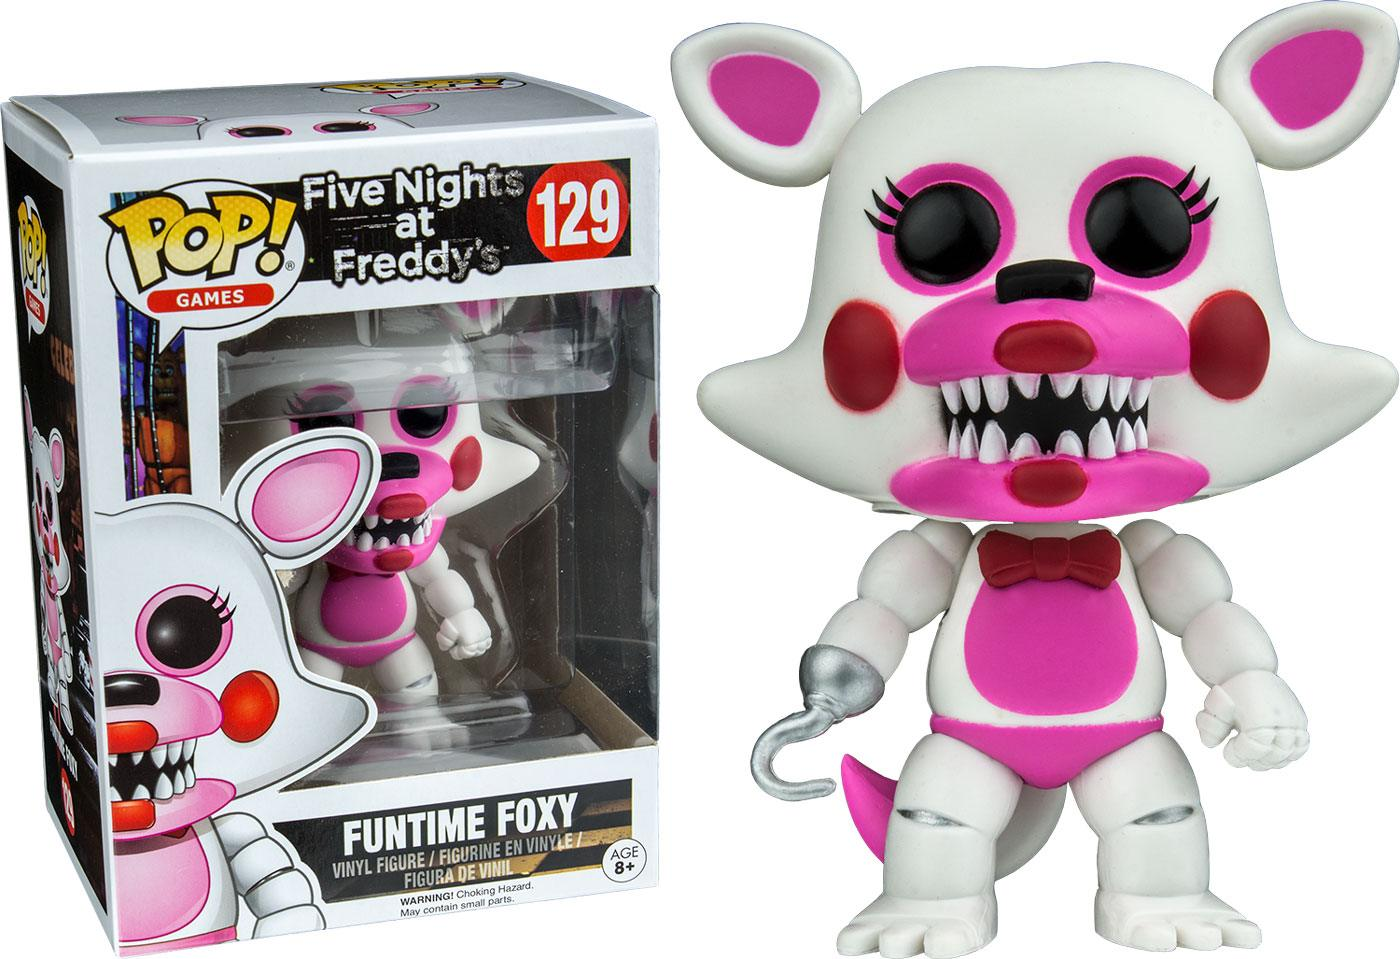 Five Nights at Freddy's POP! Games Vinyl Figure Funtime Foxy 9 cm